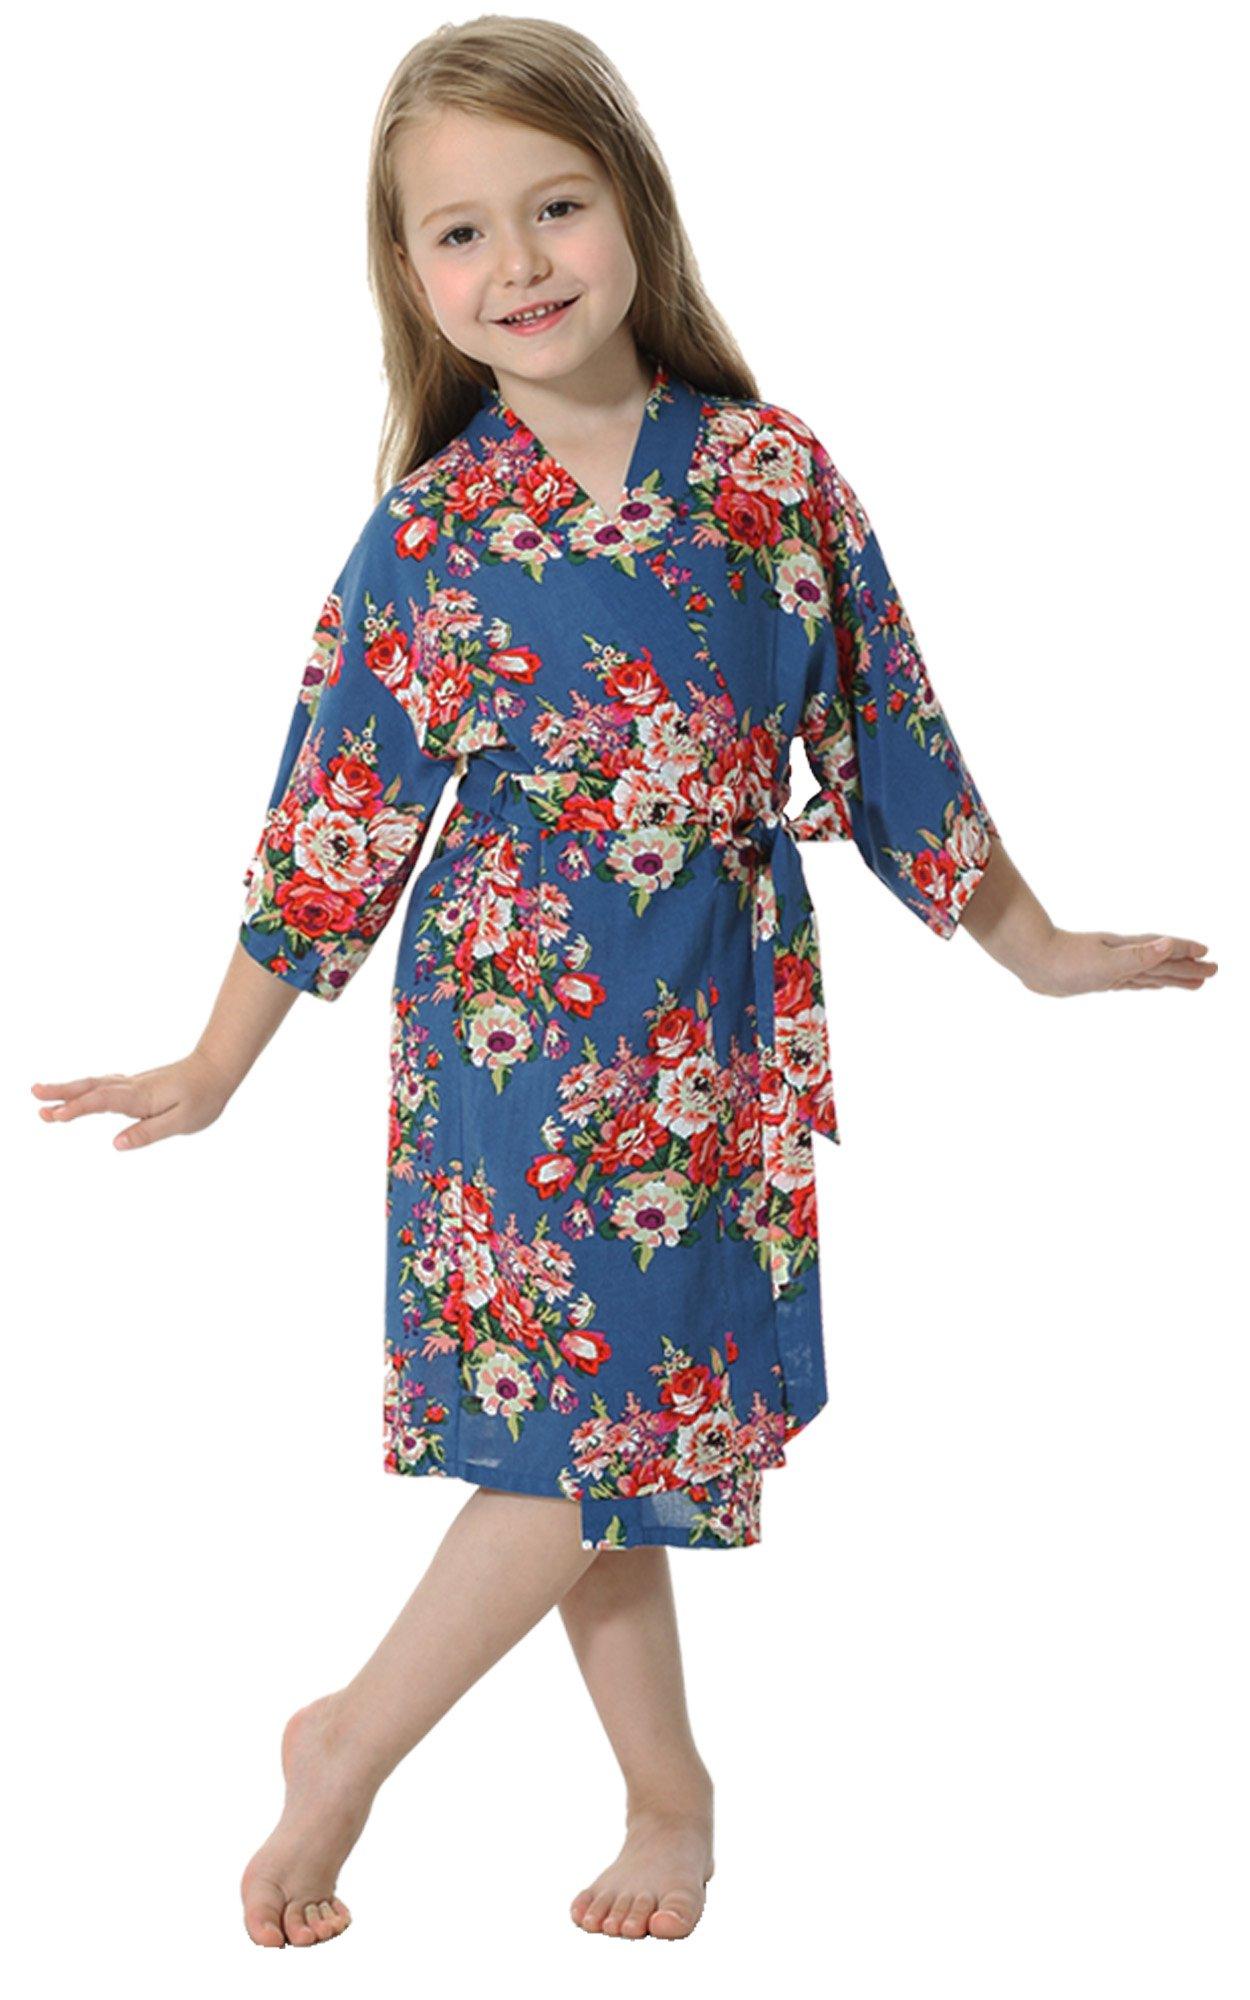 JOYTTON Girl's Cotton Floral Kimono Bathrobe Flower Girl Robe (6,Dark Blue)